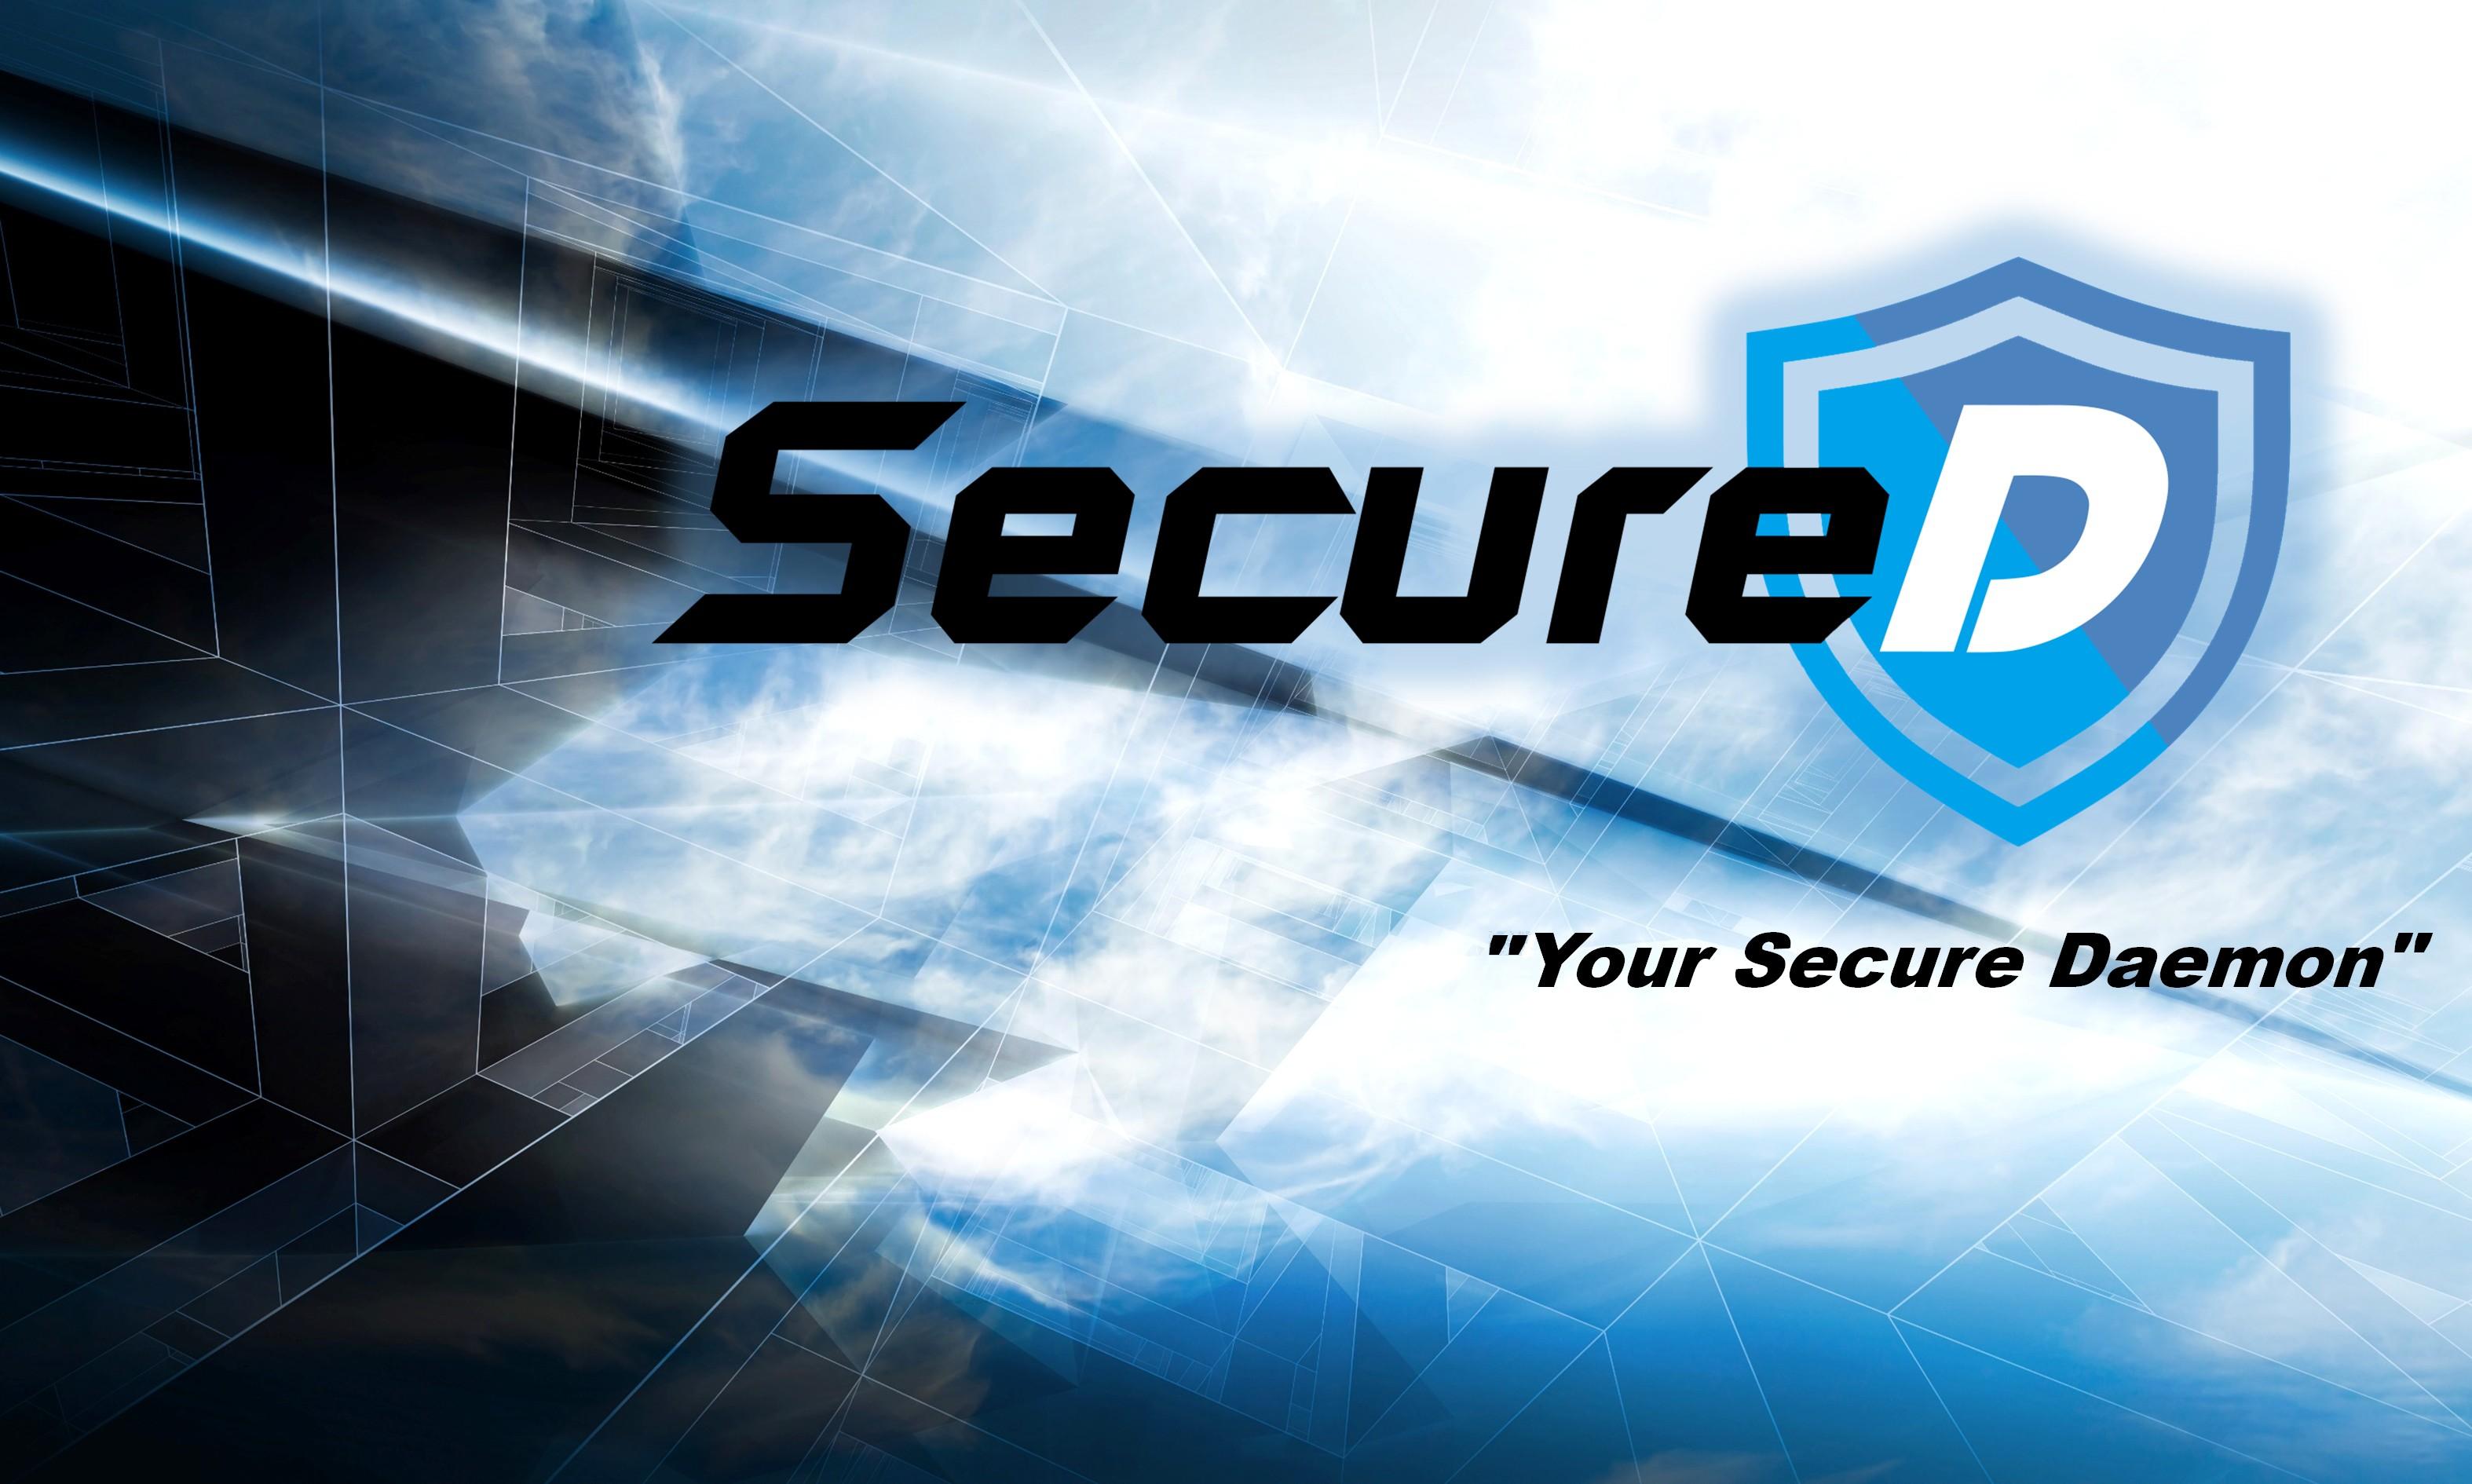 Secure D | LinkedIn